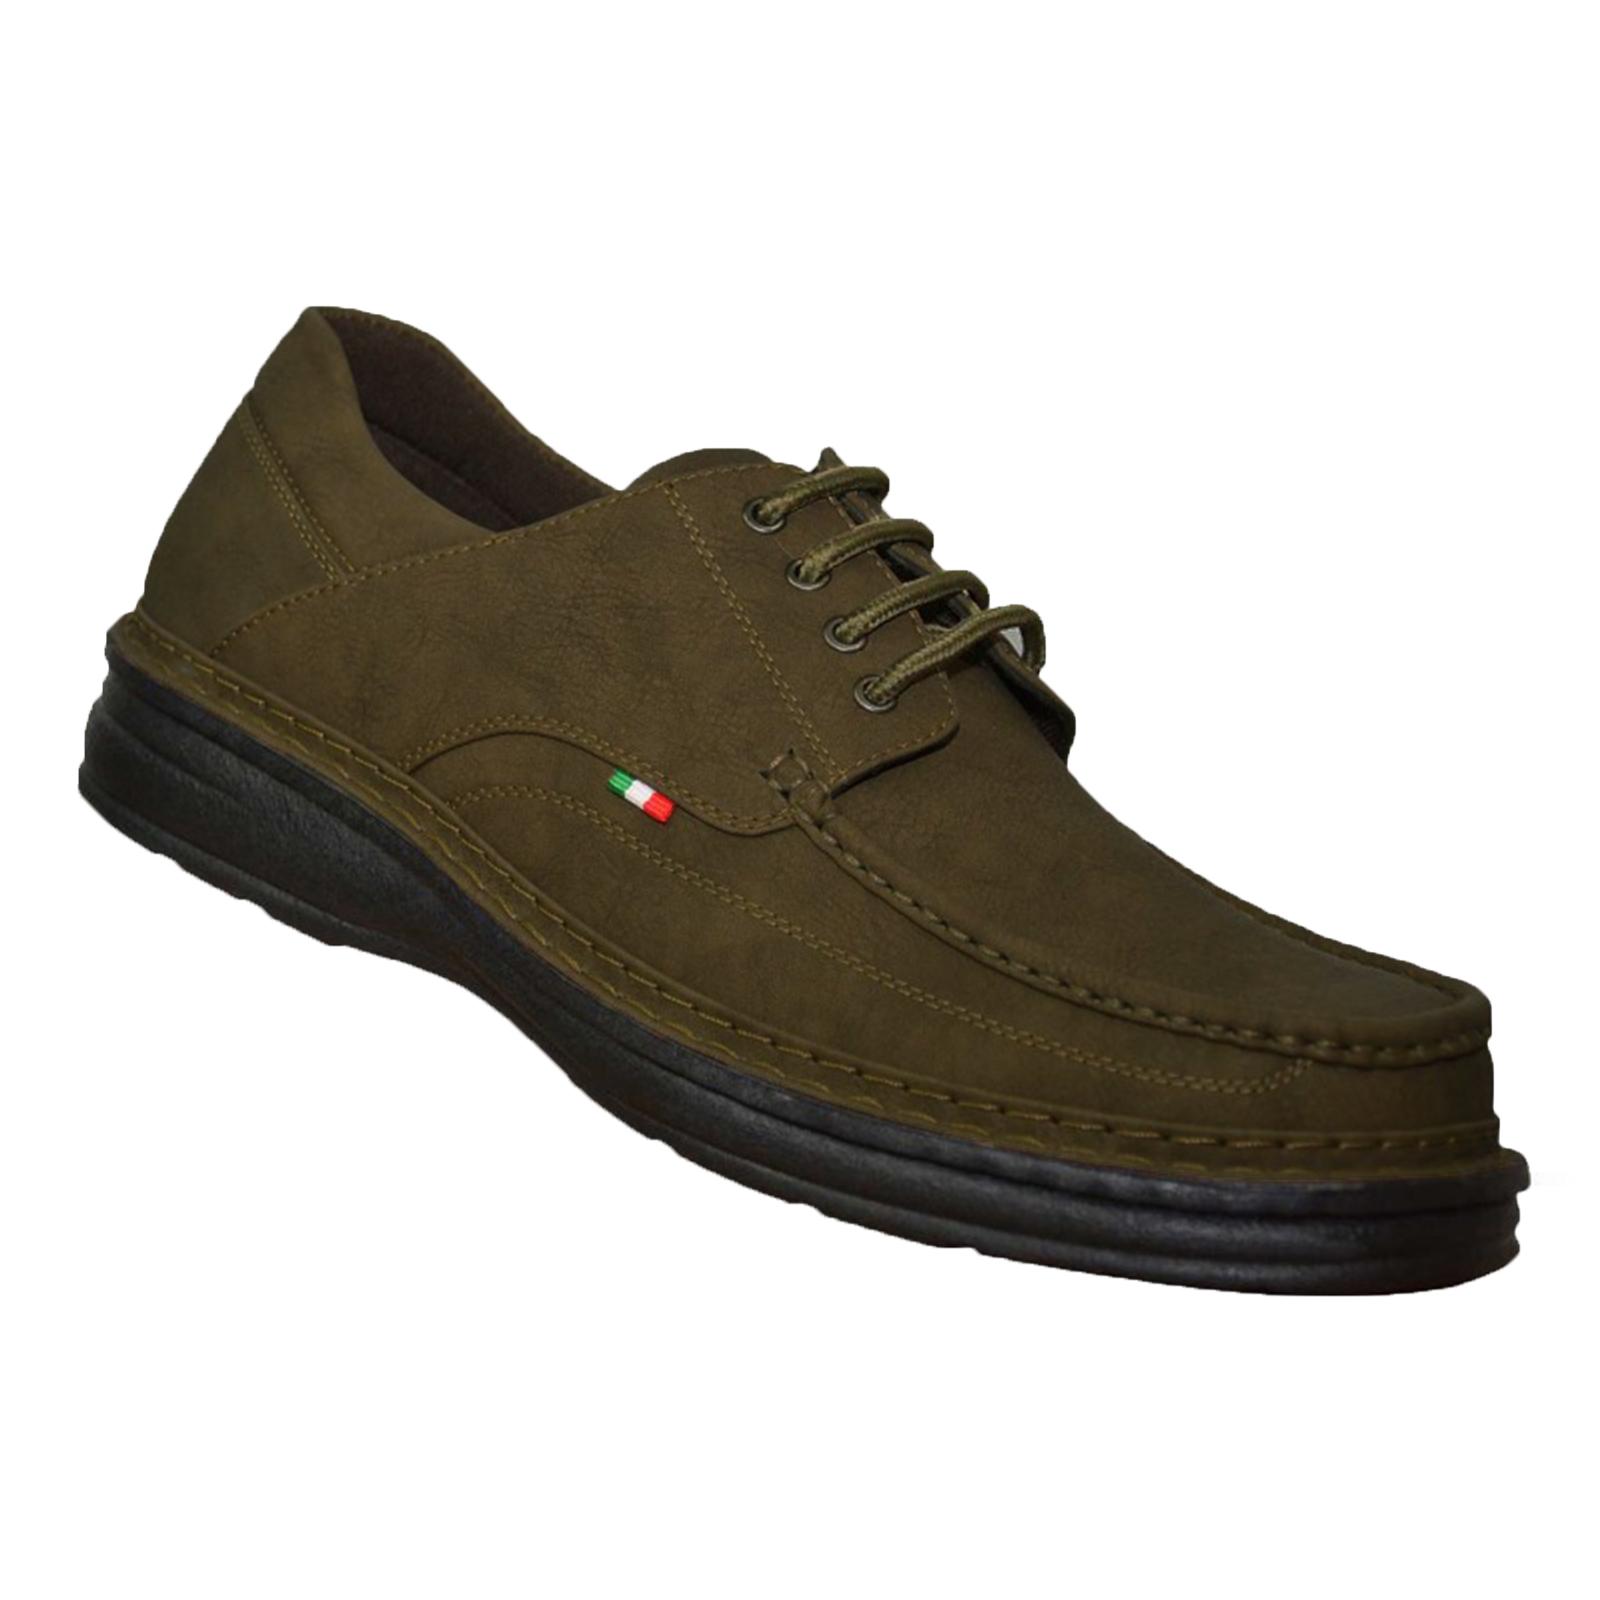 Duke-D555-Keanu-para-hombre-Big-King-Size-Zapatos-Con-Cordones-Calzado-de-Disenador-de-Cuero-PU miniatura 4